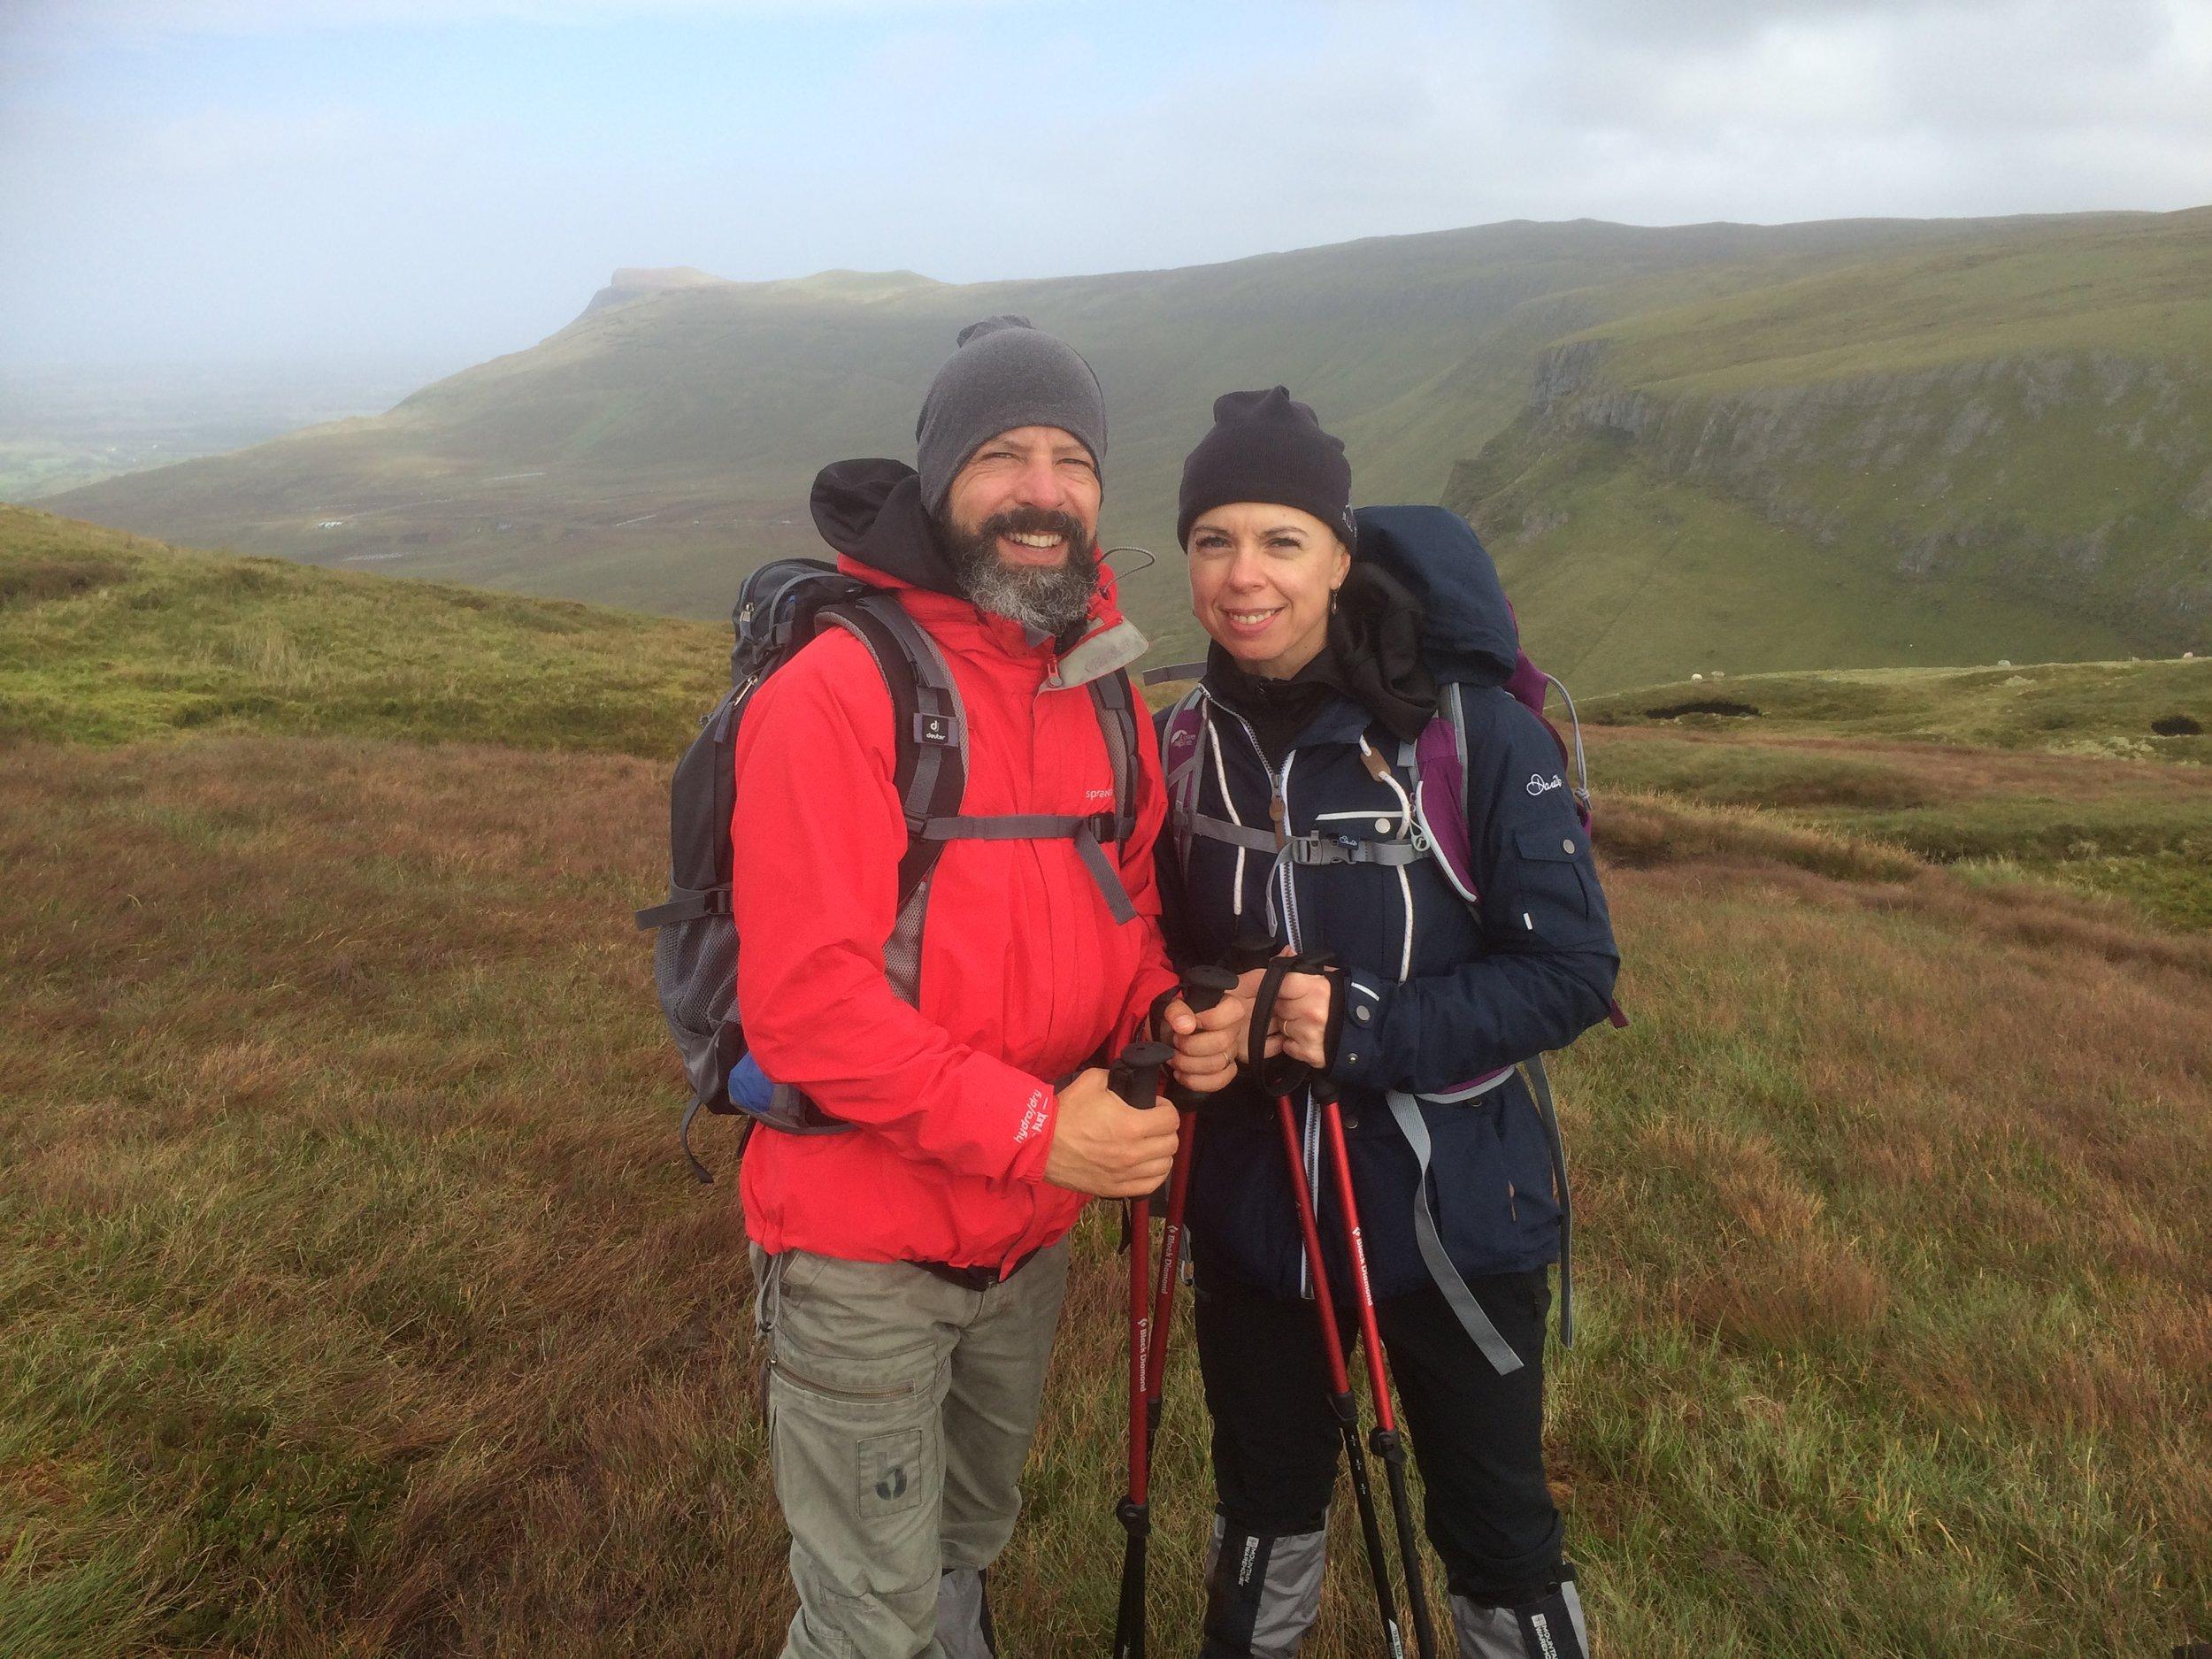 Tomasz and Agata enjoying hiking on Benbulben with High Hopes Hiking